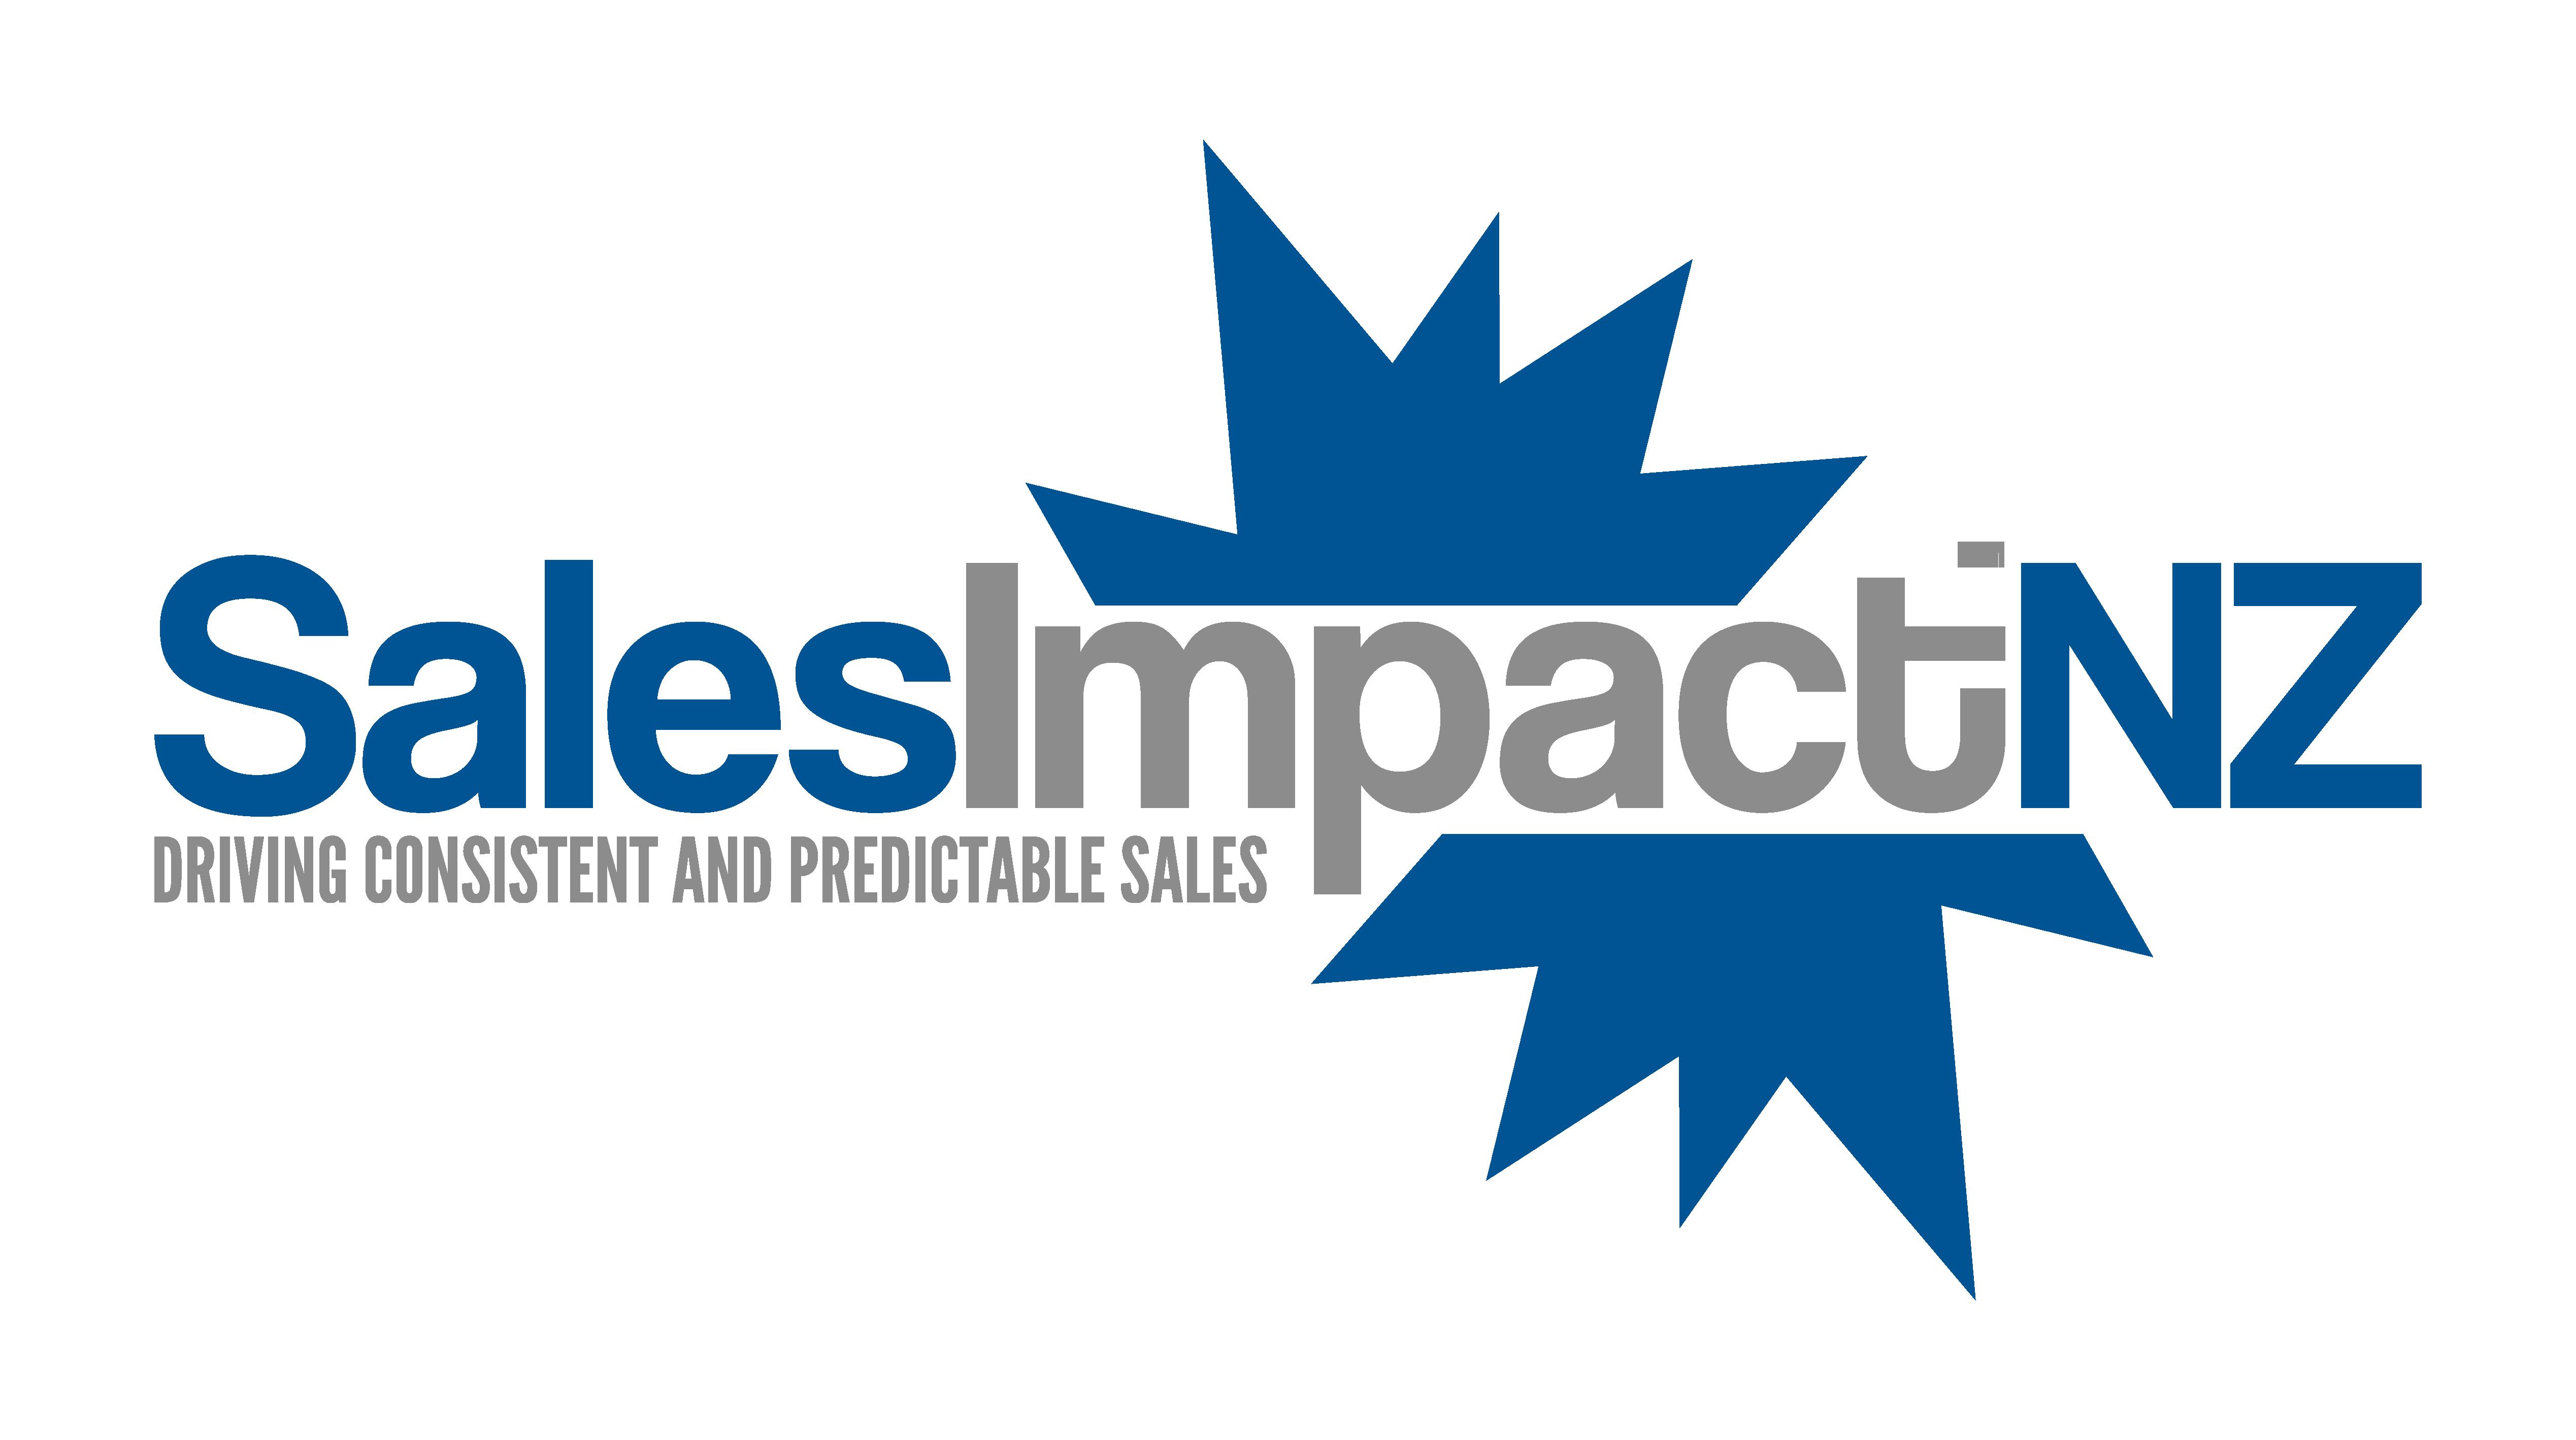 Sales Impact NZ